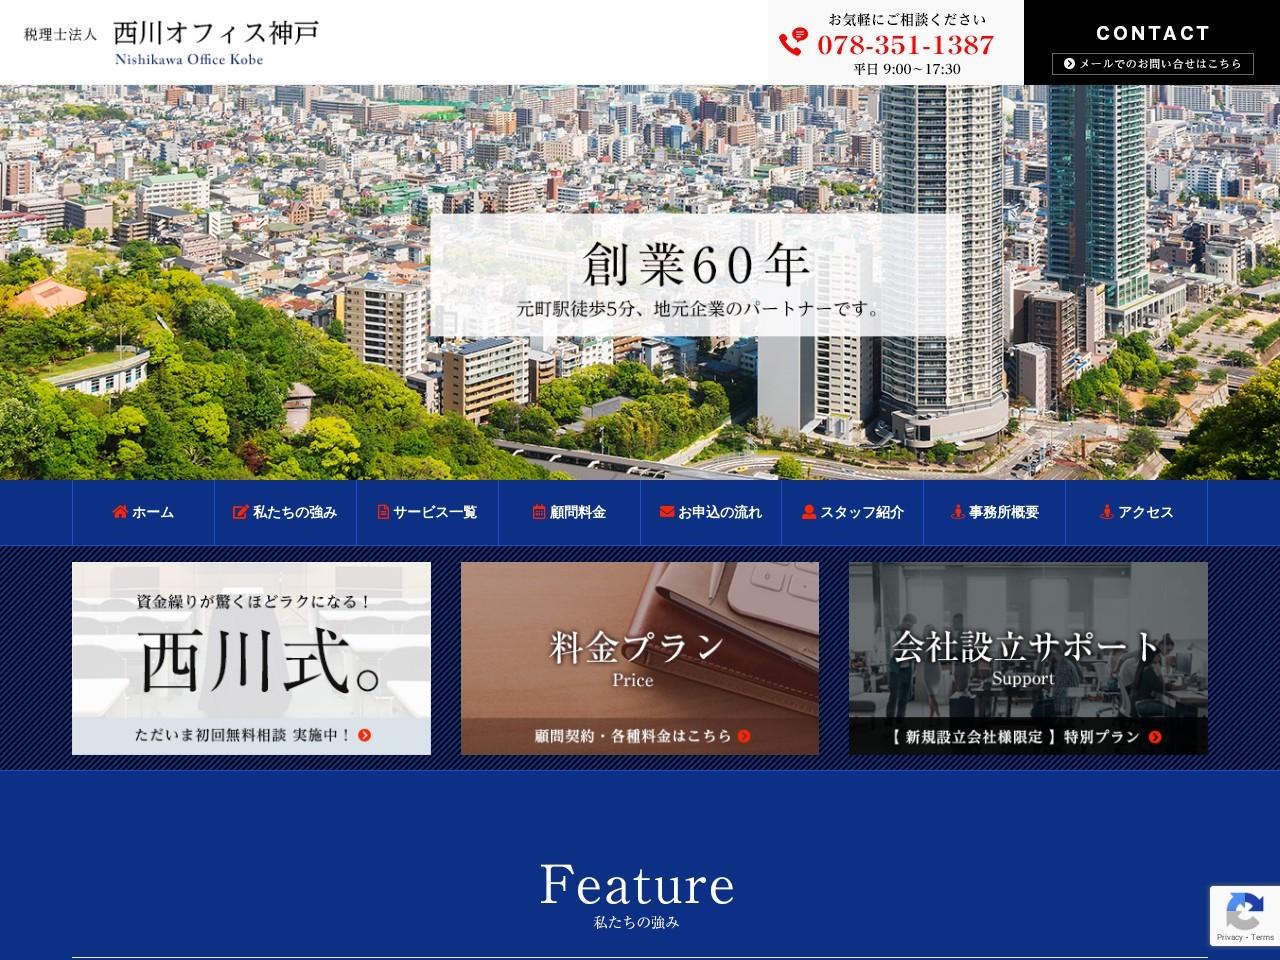 西川オフィス神戸(税理士法人)